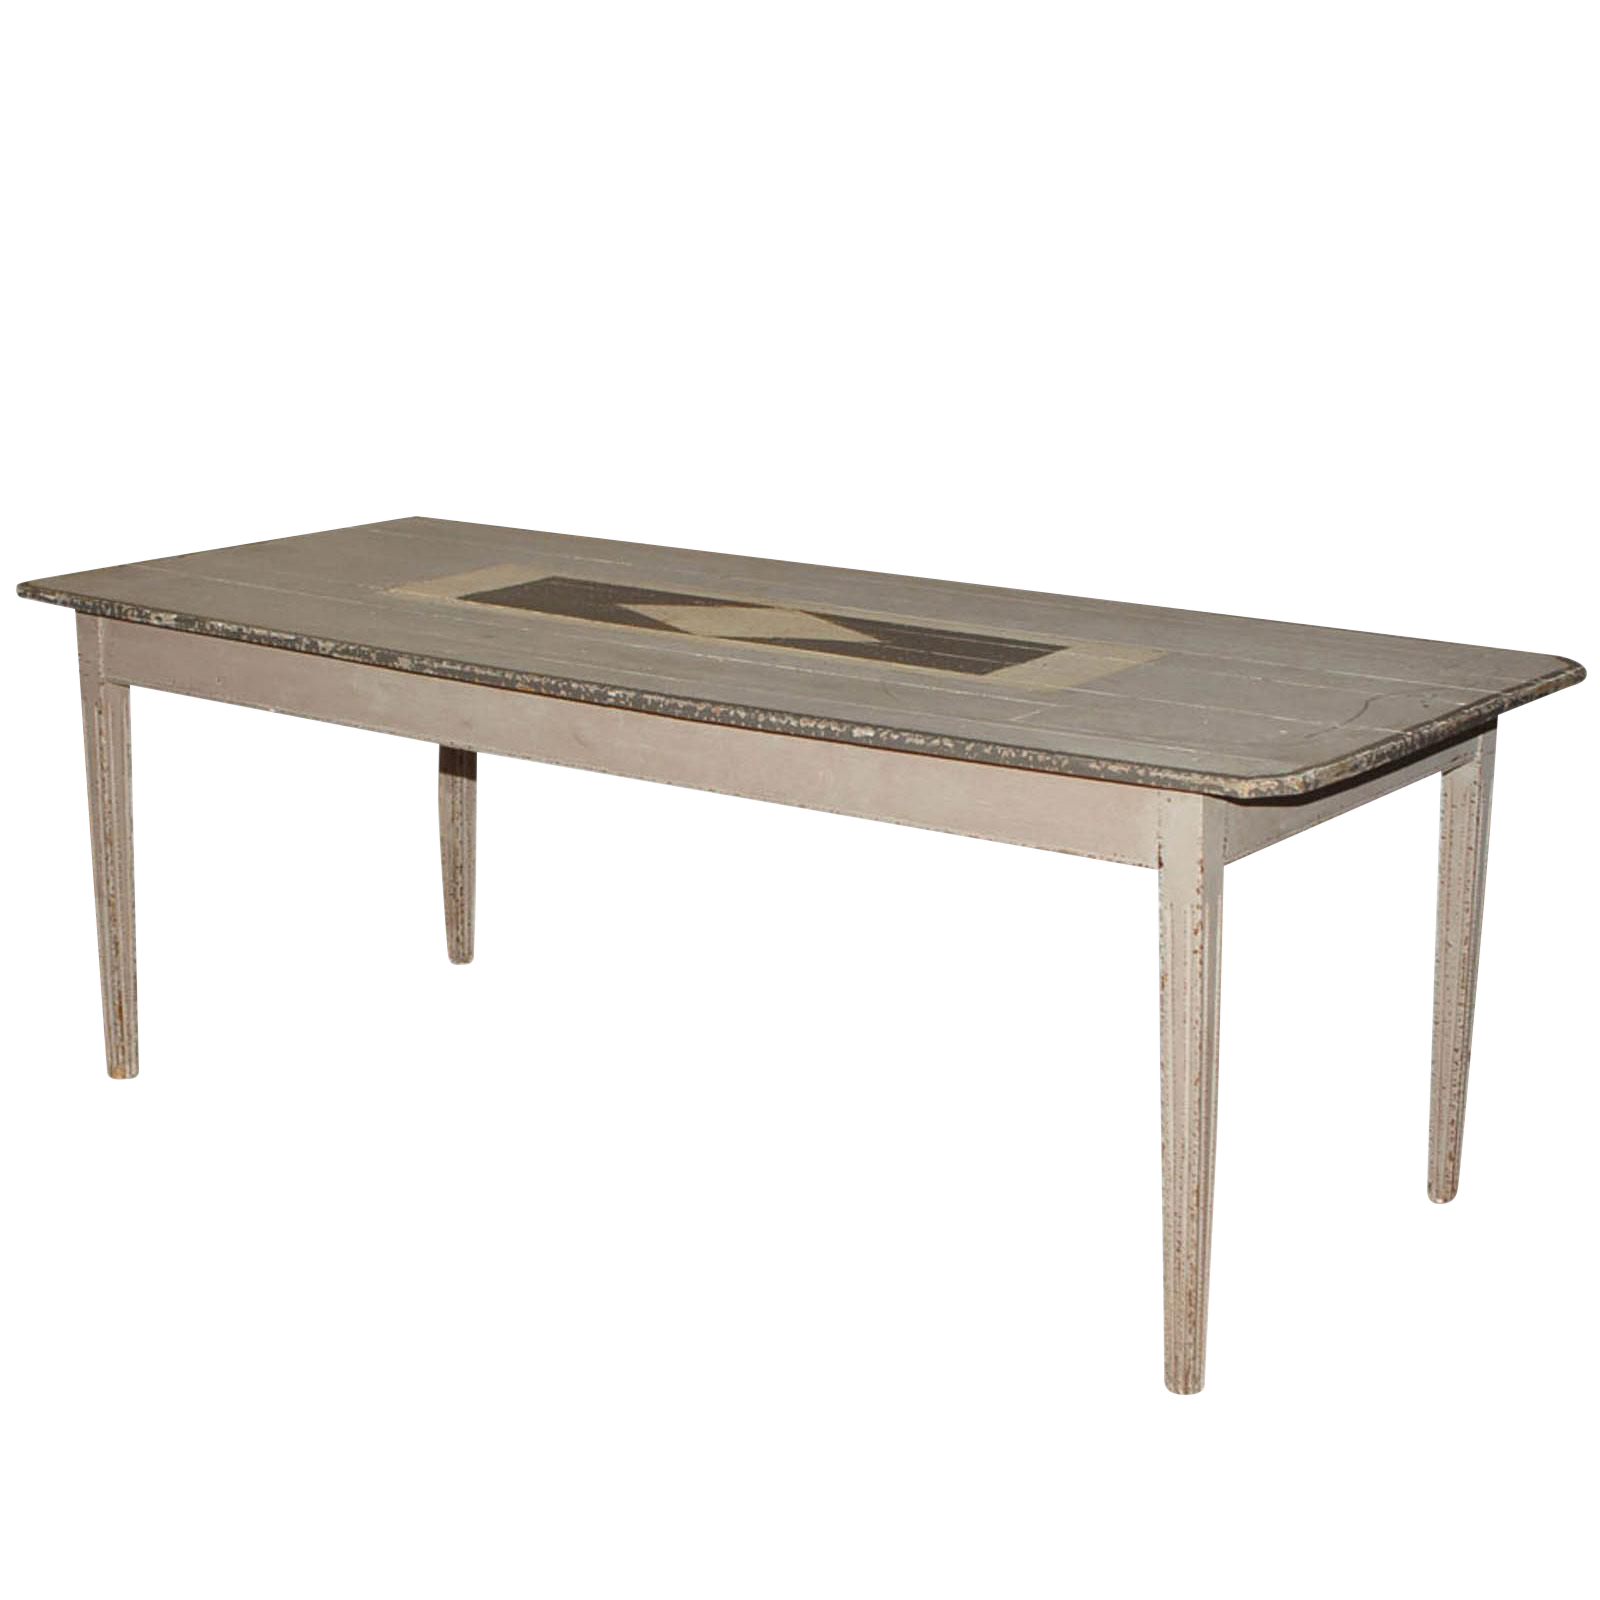 Superieur 1870 Gray Painted Farm Table